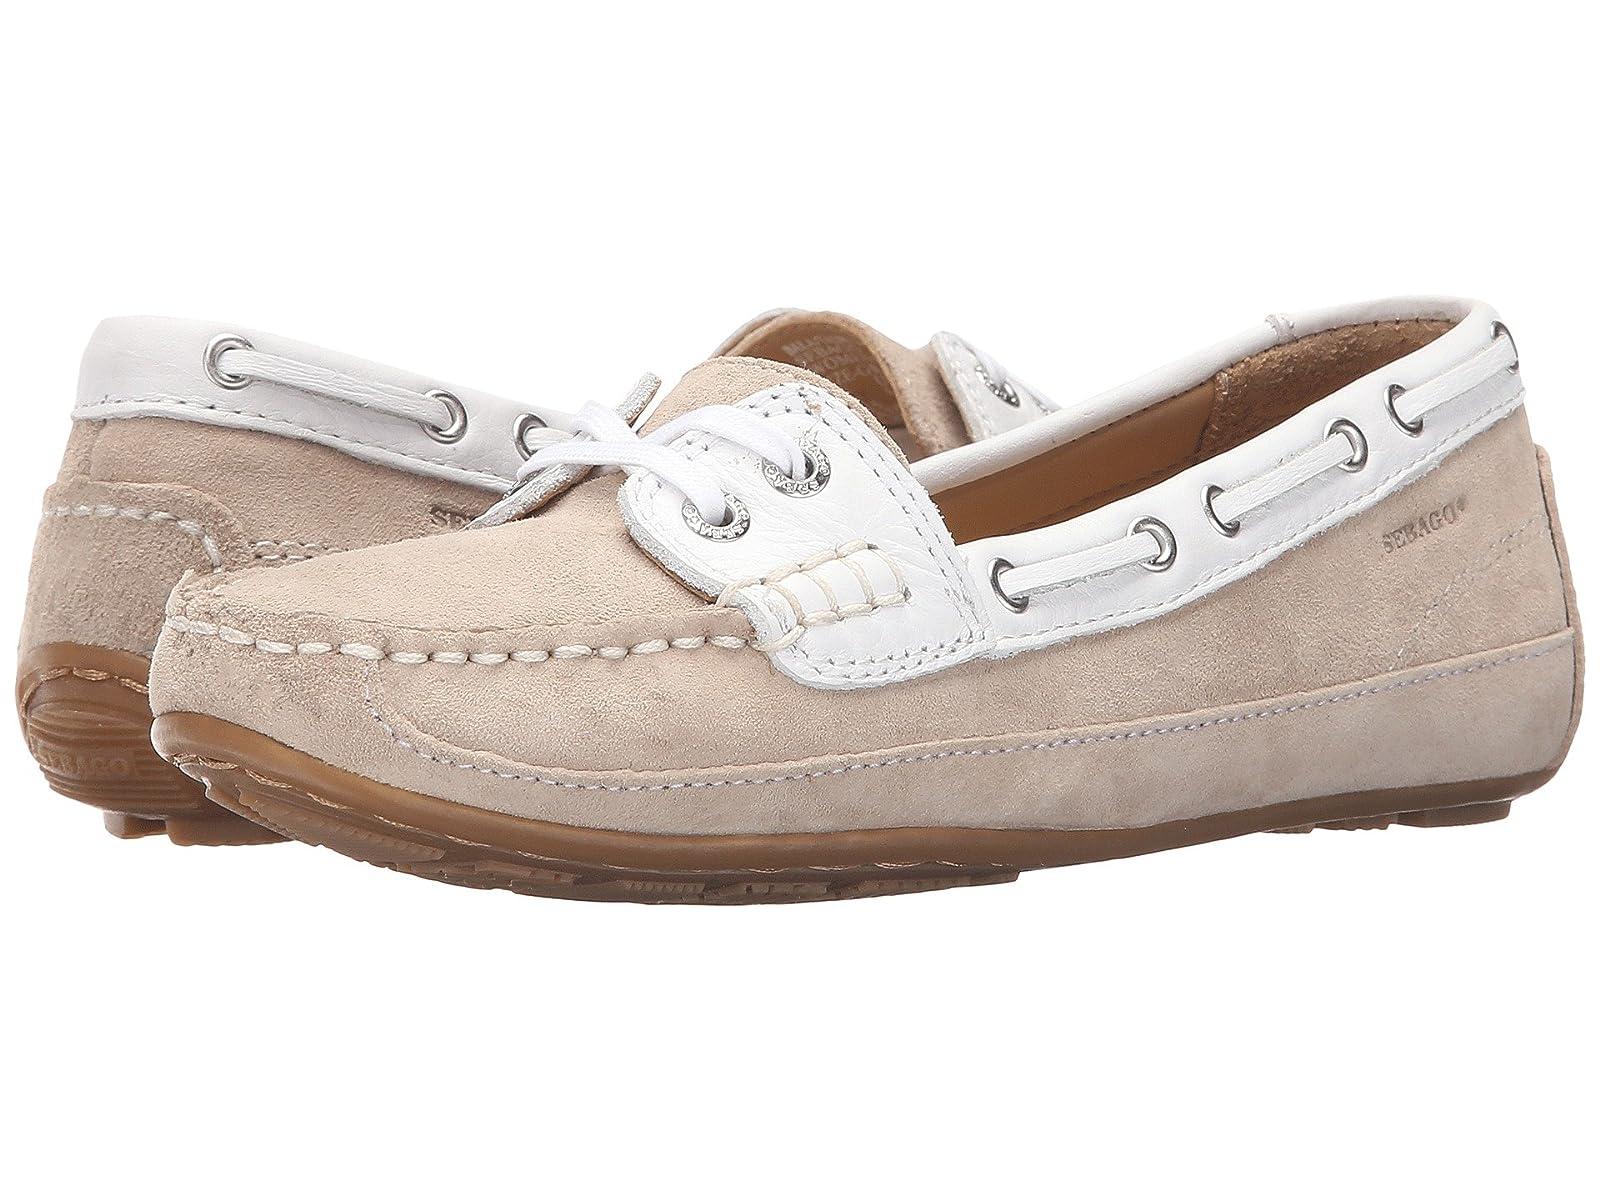 Sebago BalaSelling fashionable and eye-catching shoes